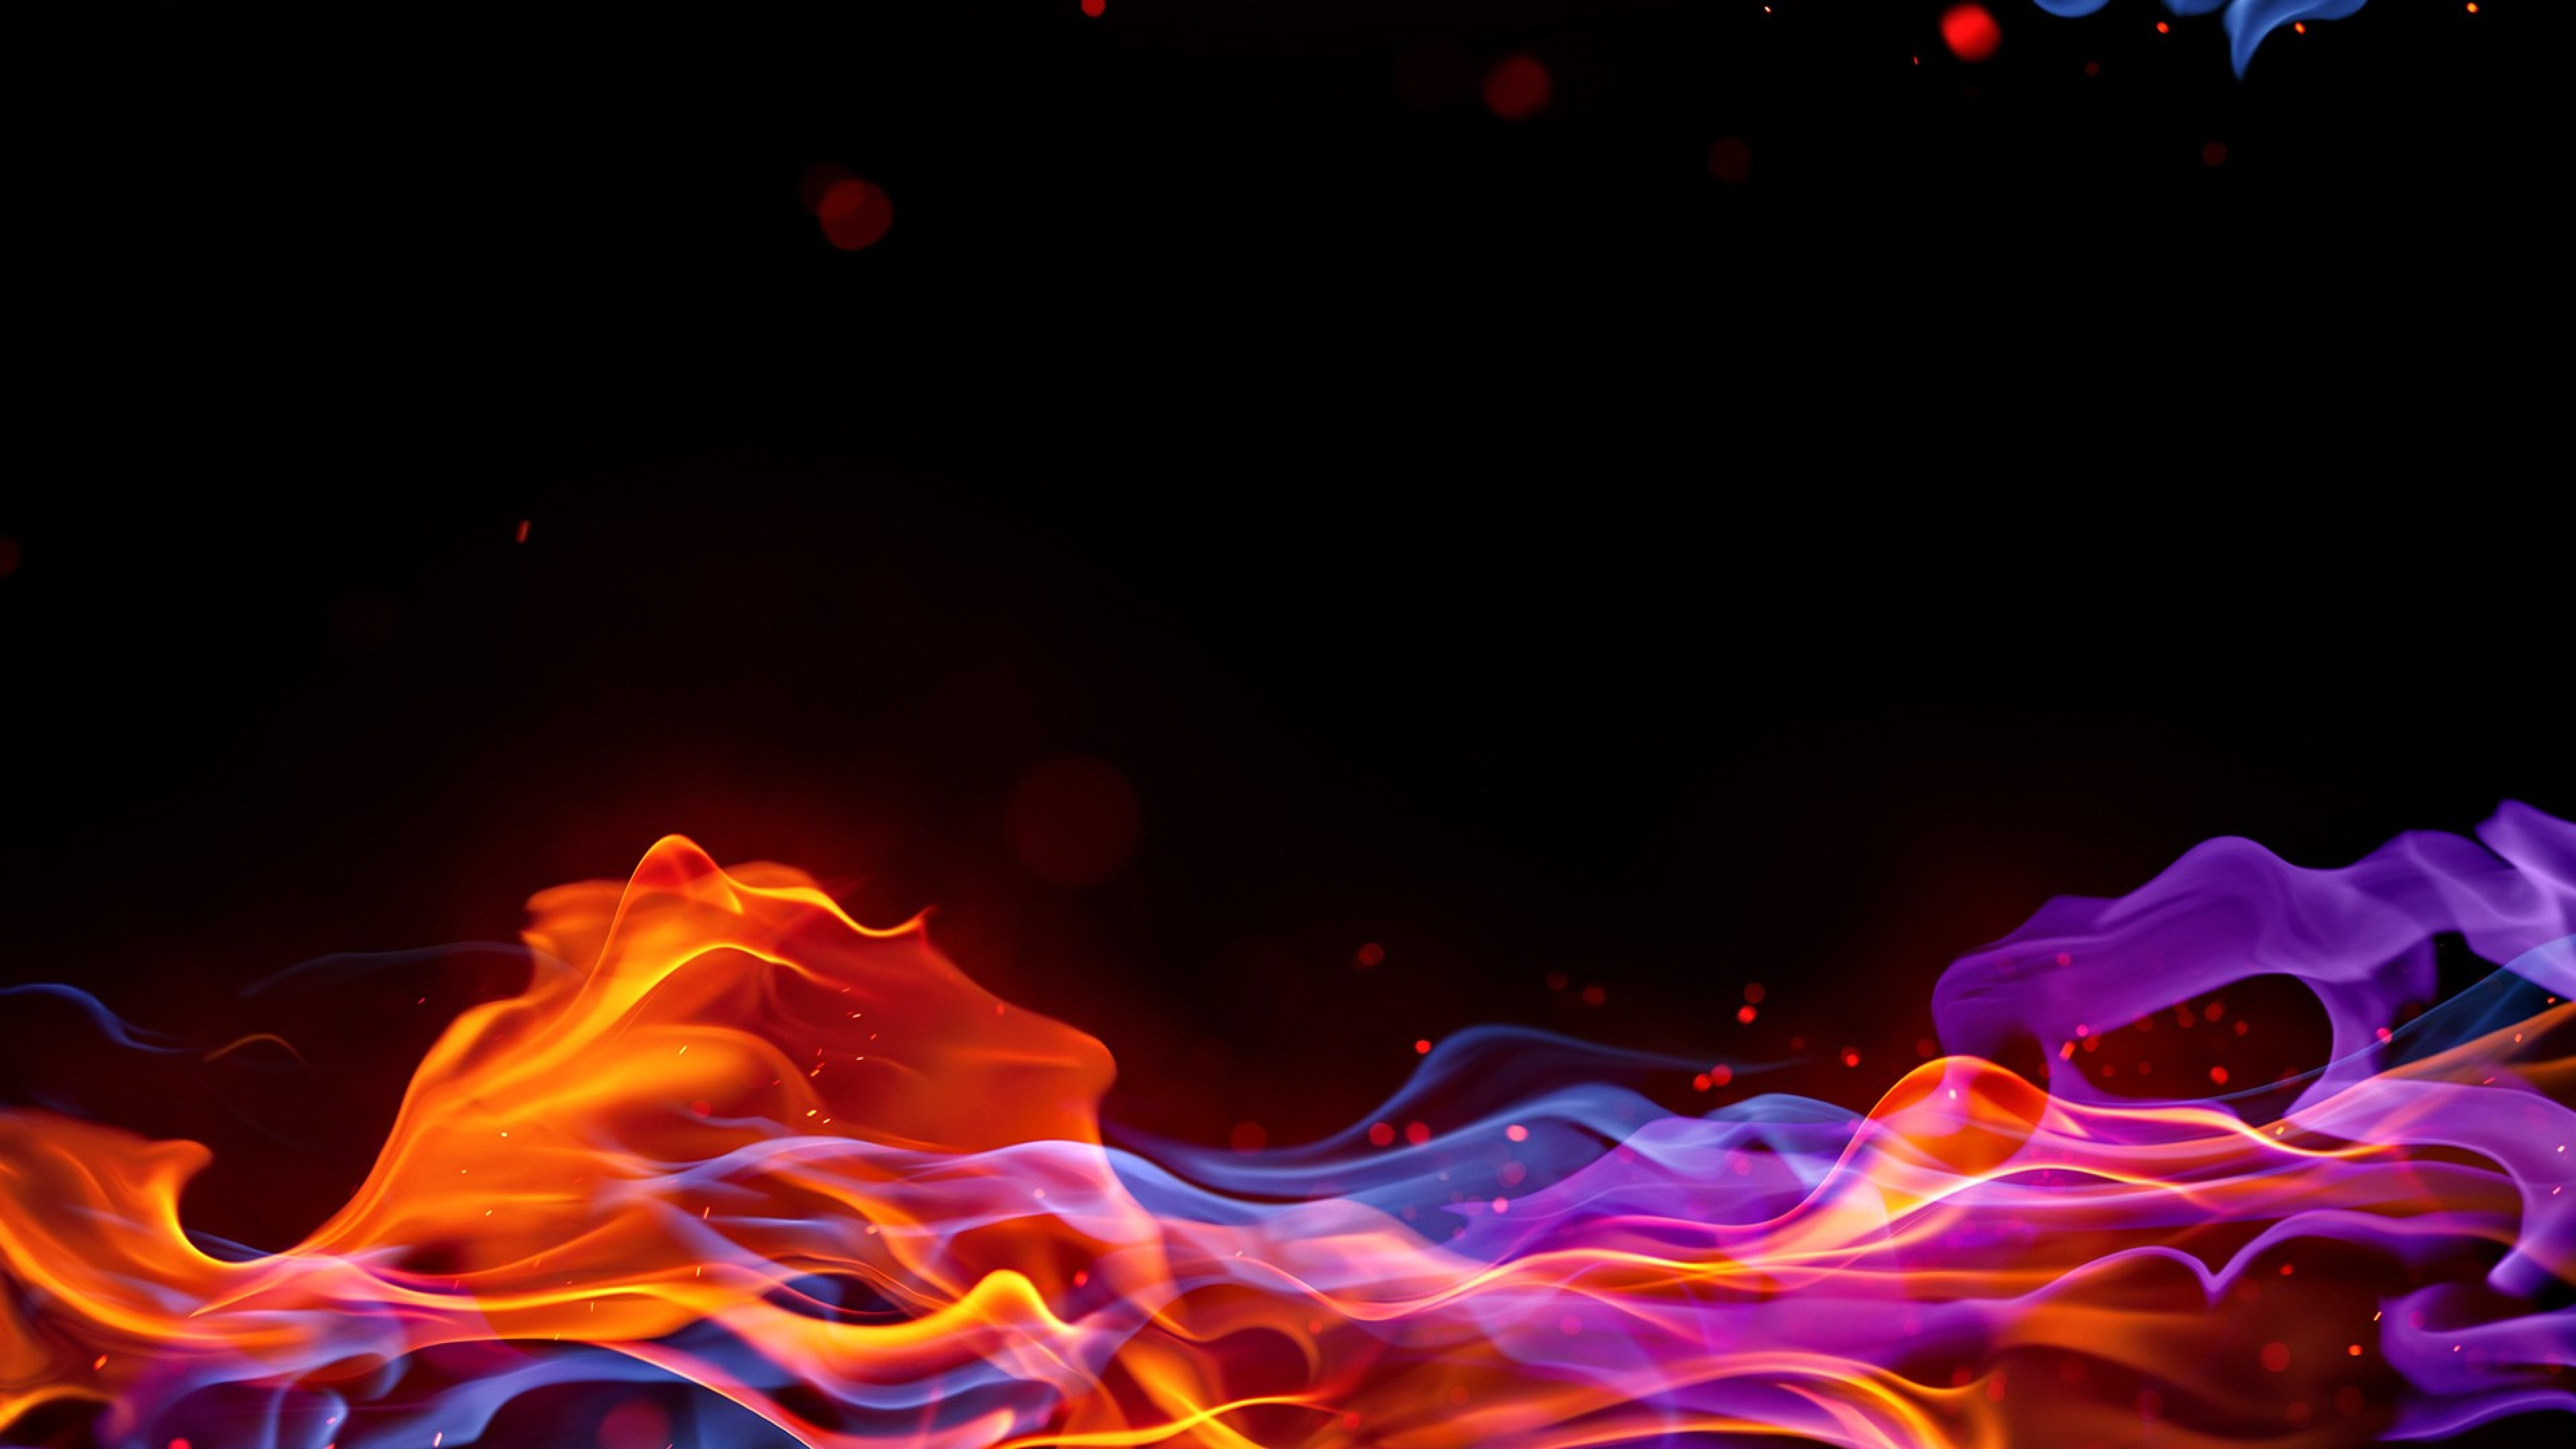 Plasma In Vivid Colors Wallpapers Trend